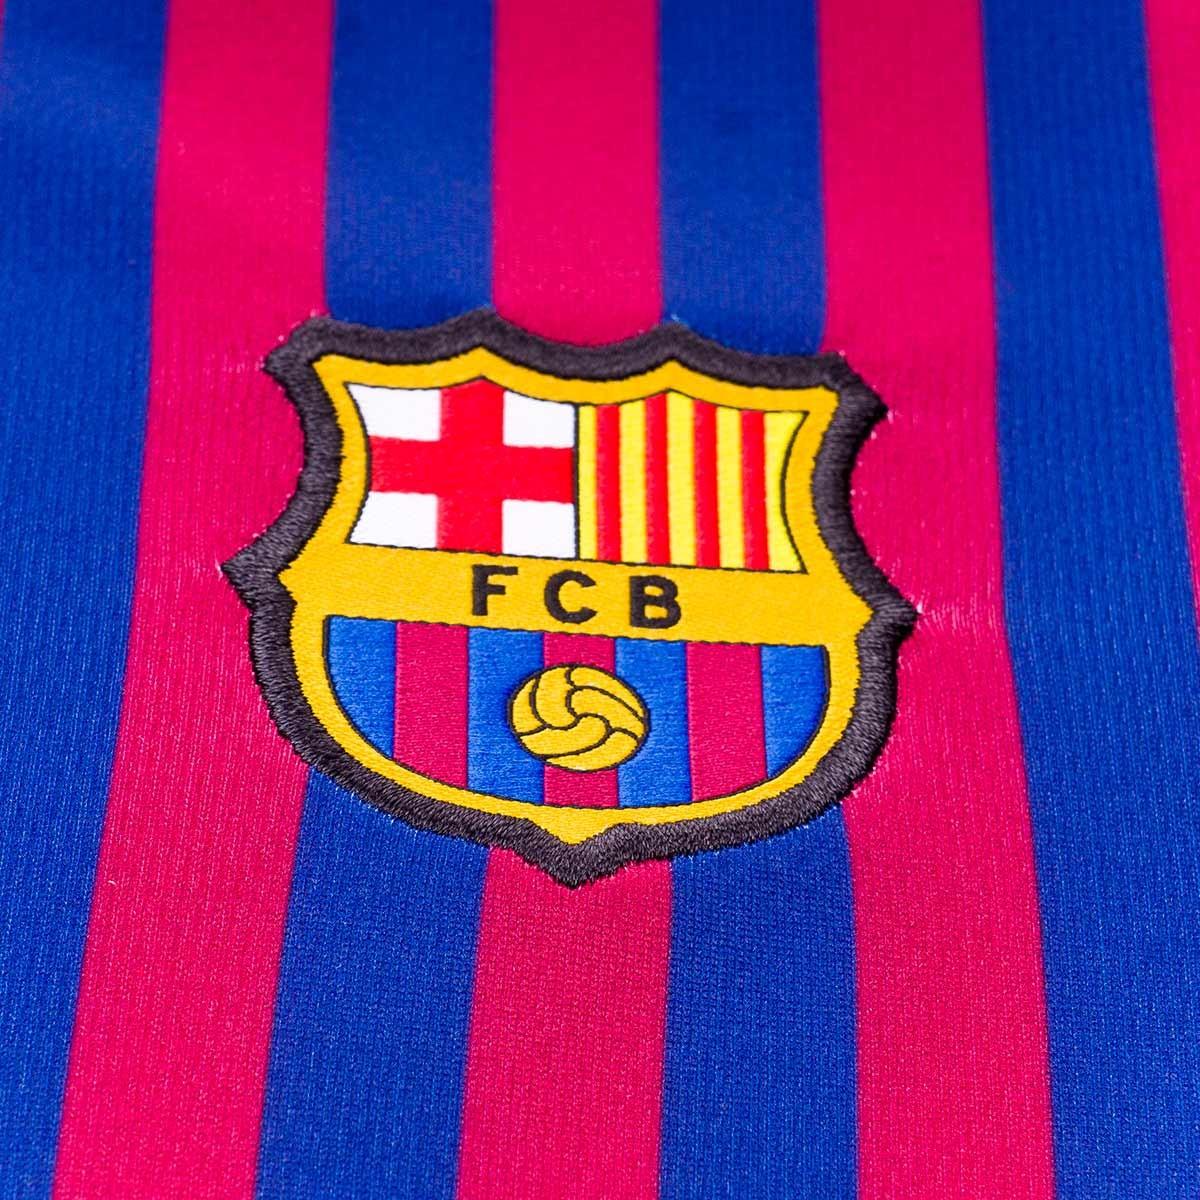 Kit Nike Kids FC Barcelona 2018-2019 Home Deep royal  blue-Obsidian-University gold - Leaked soccer fde1edd5aec